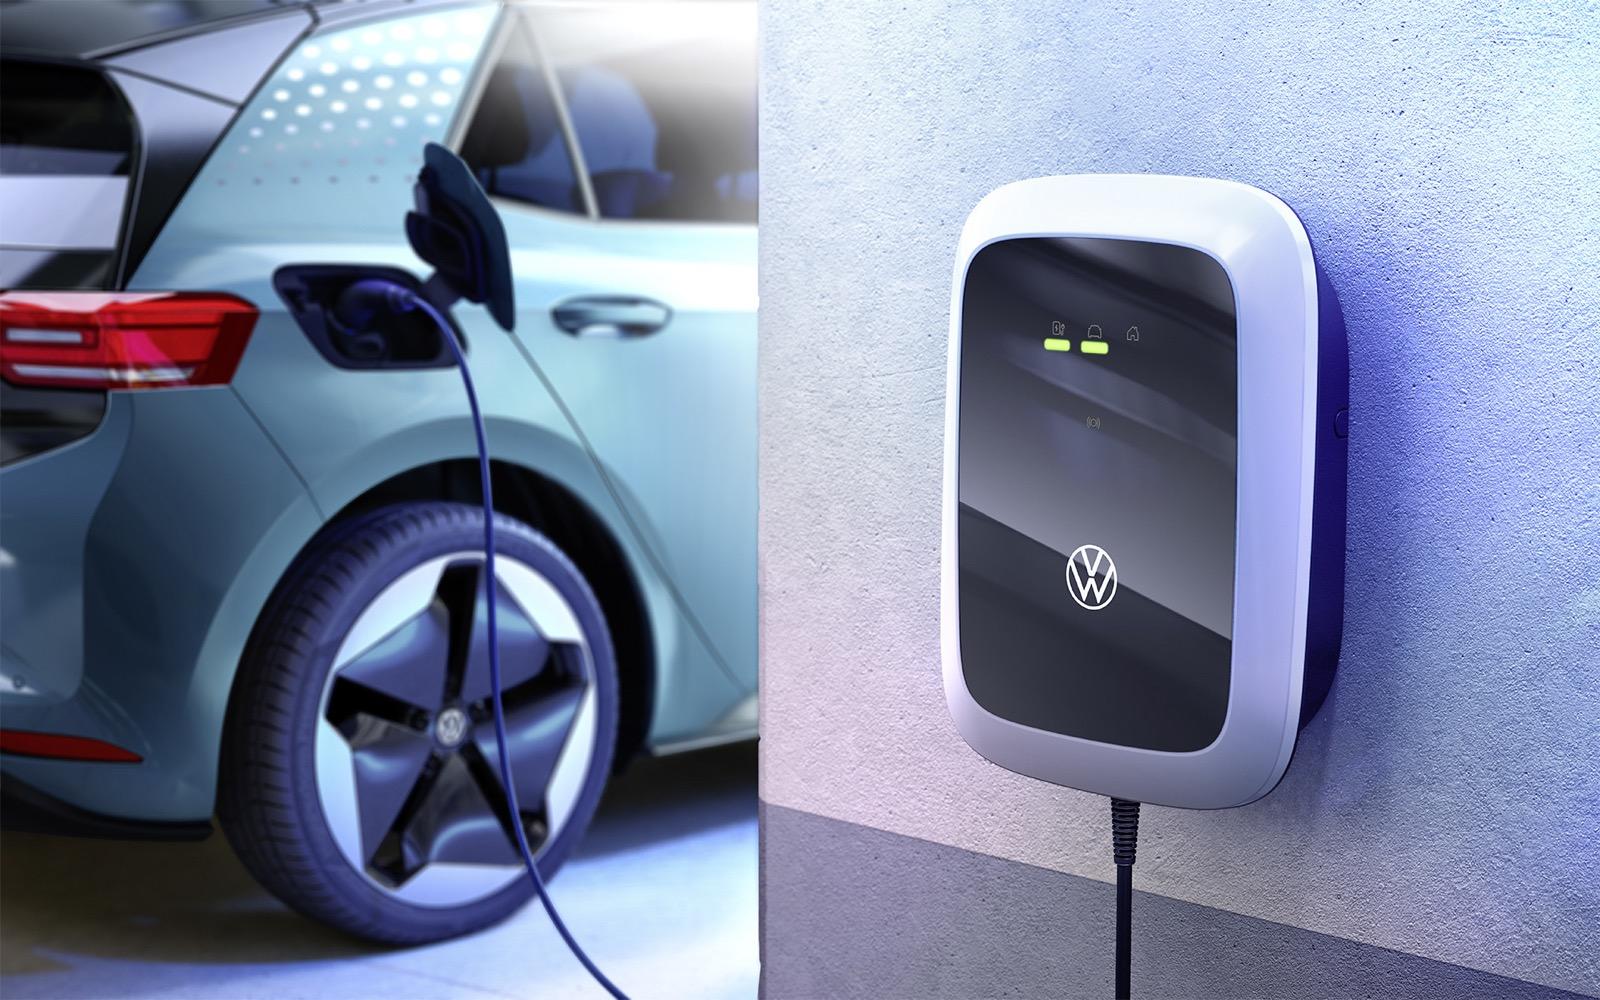 VW Wallbox